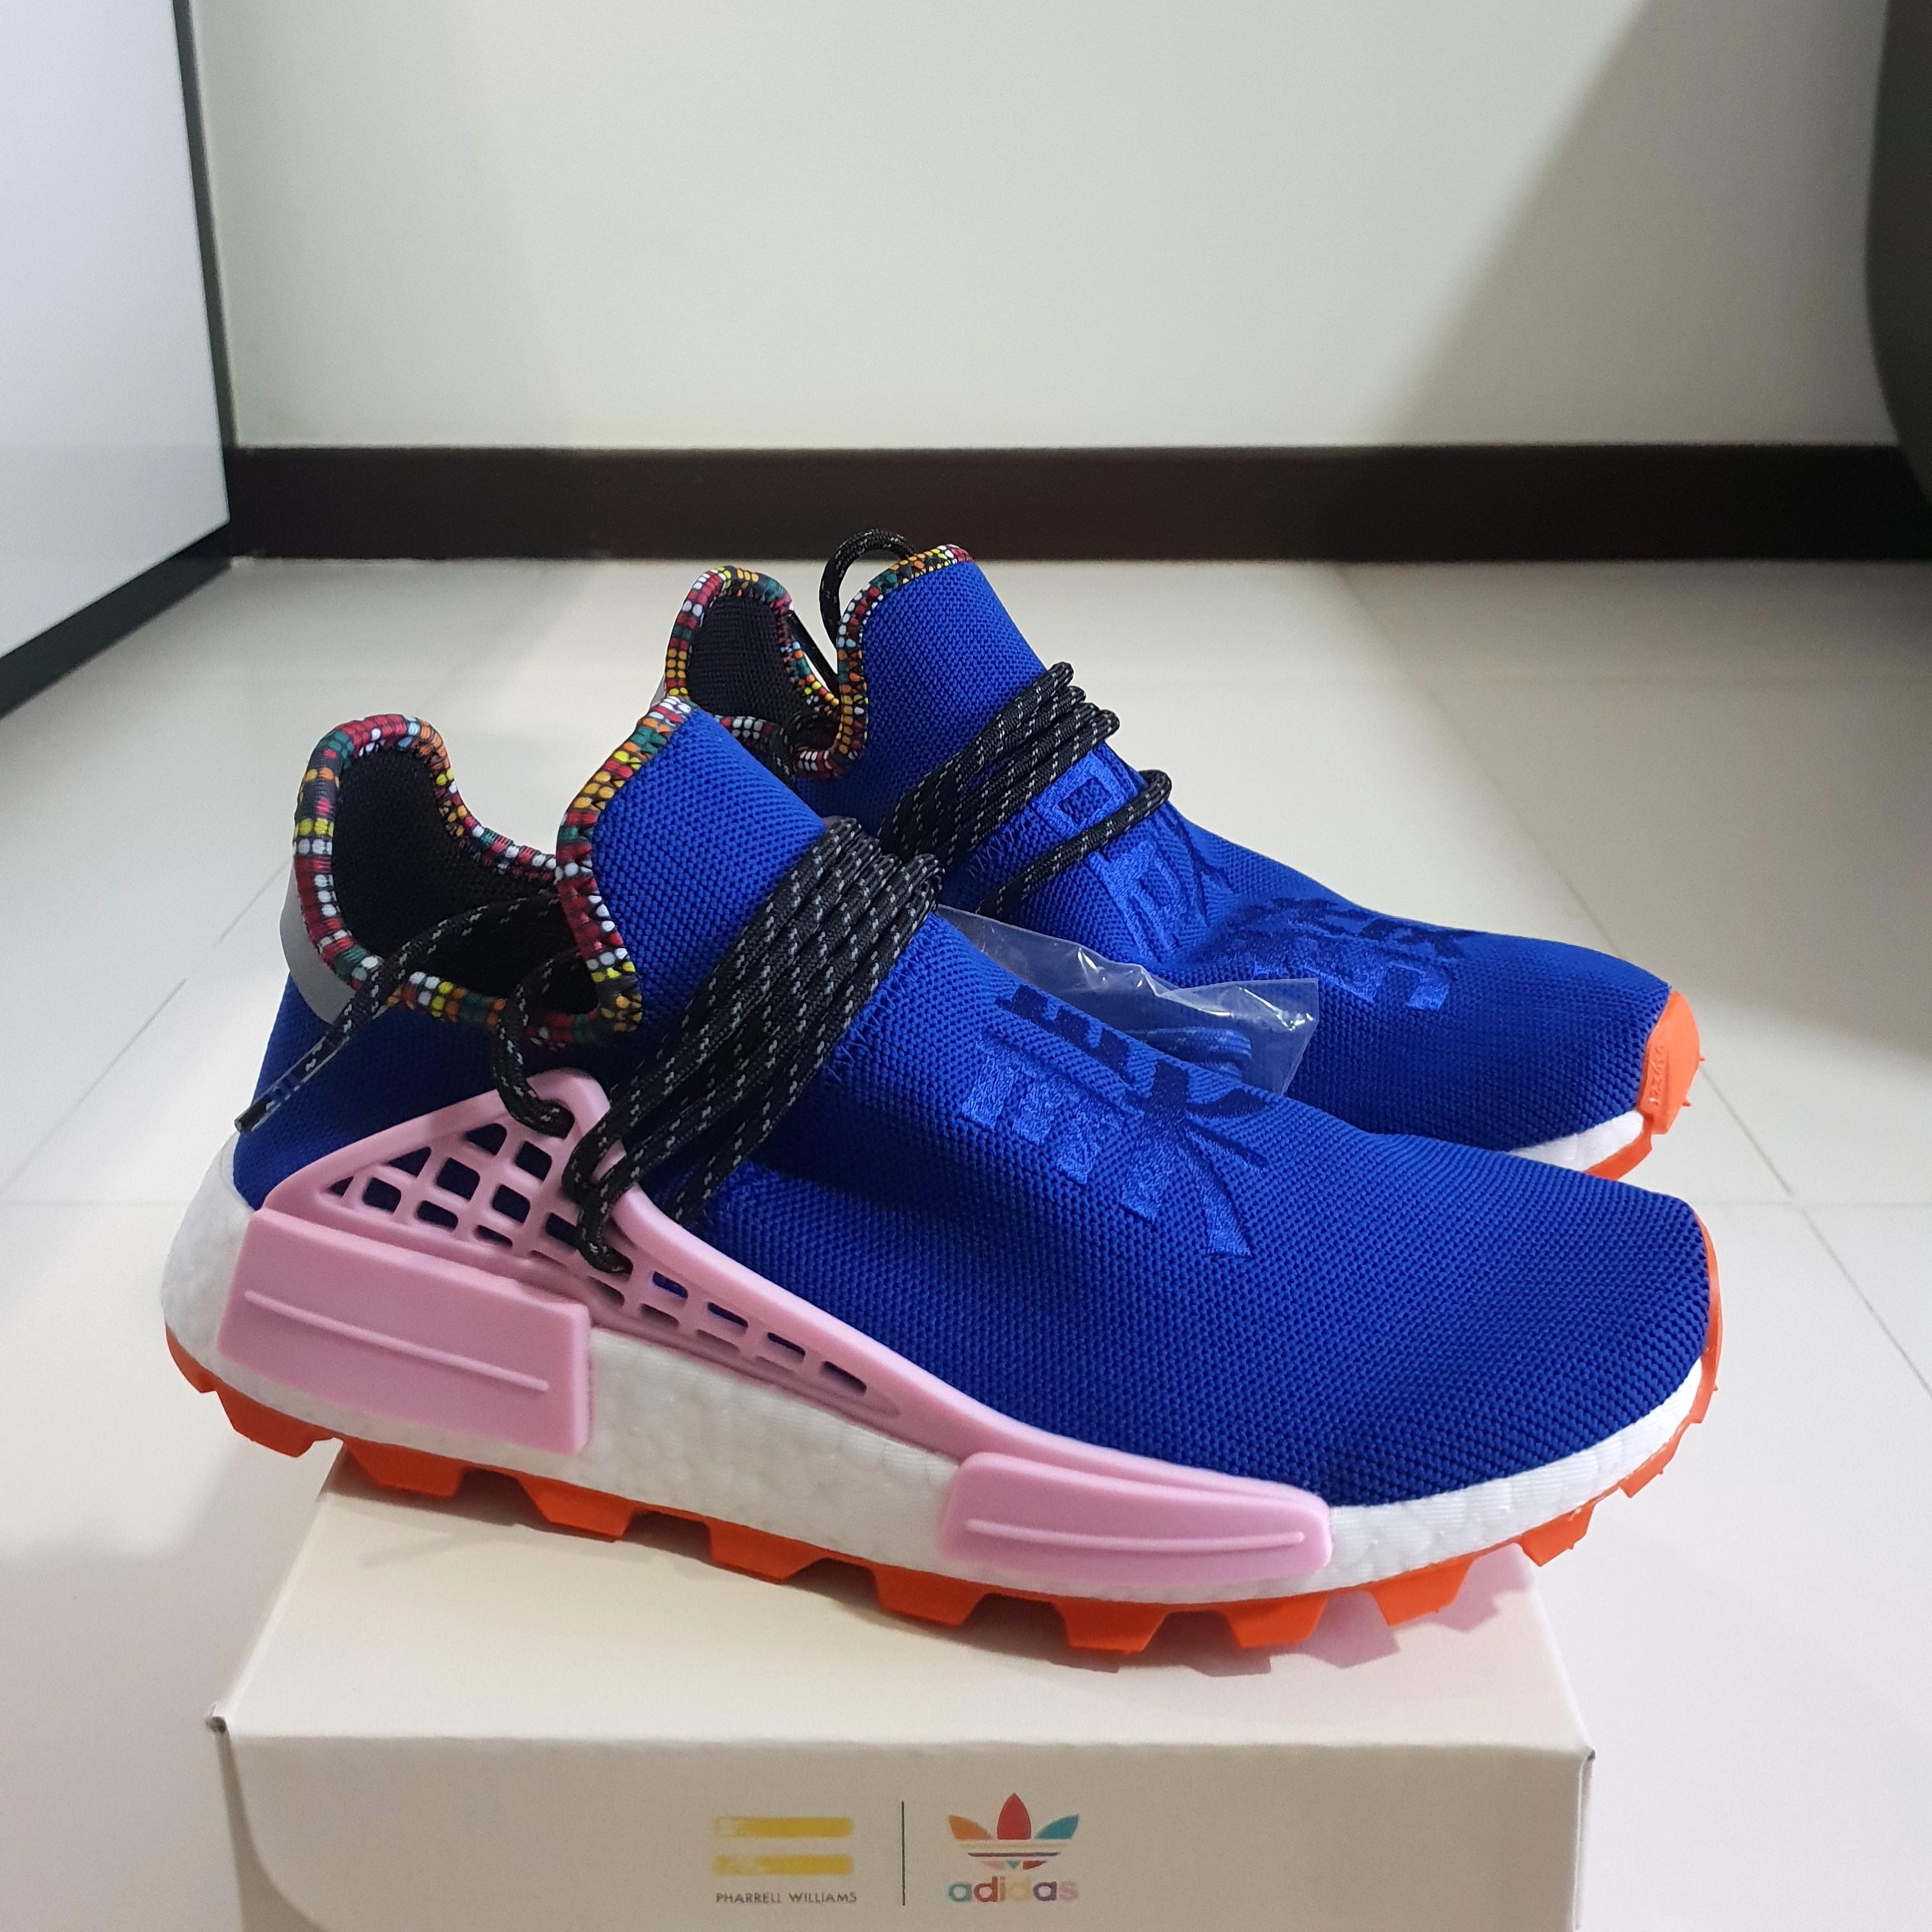 lowest price 93e47 3b881 Adidas NMD Pharrell Williams PW Human Race Powder Blue Orange Inspiration  Pack, Men s Fashion, Footwear, Sneakers on Carousell